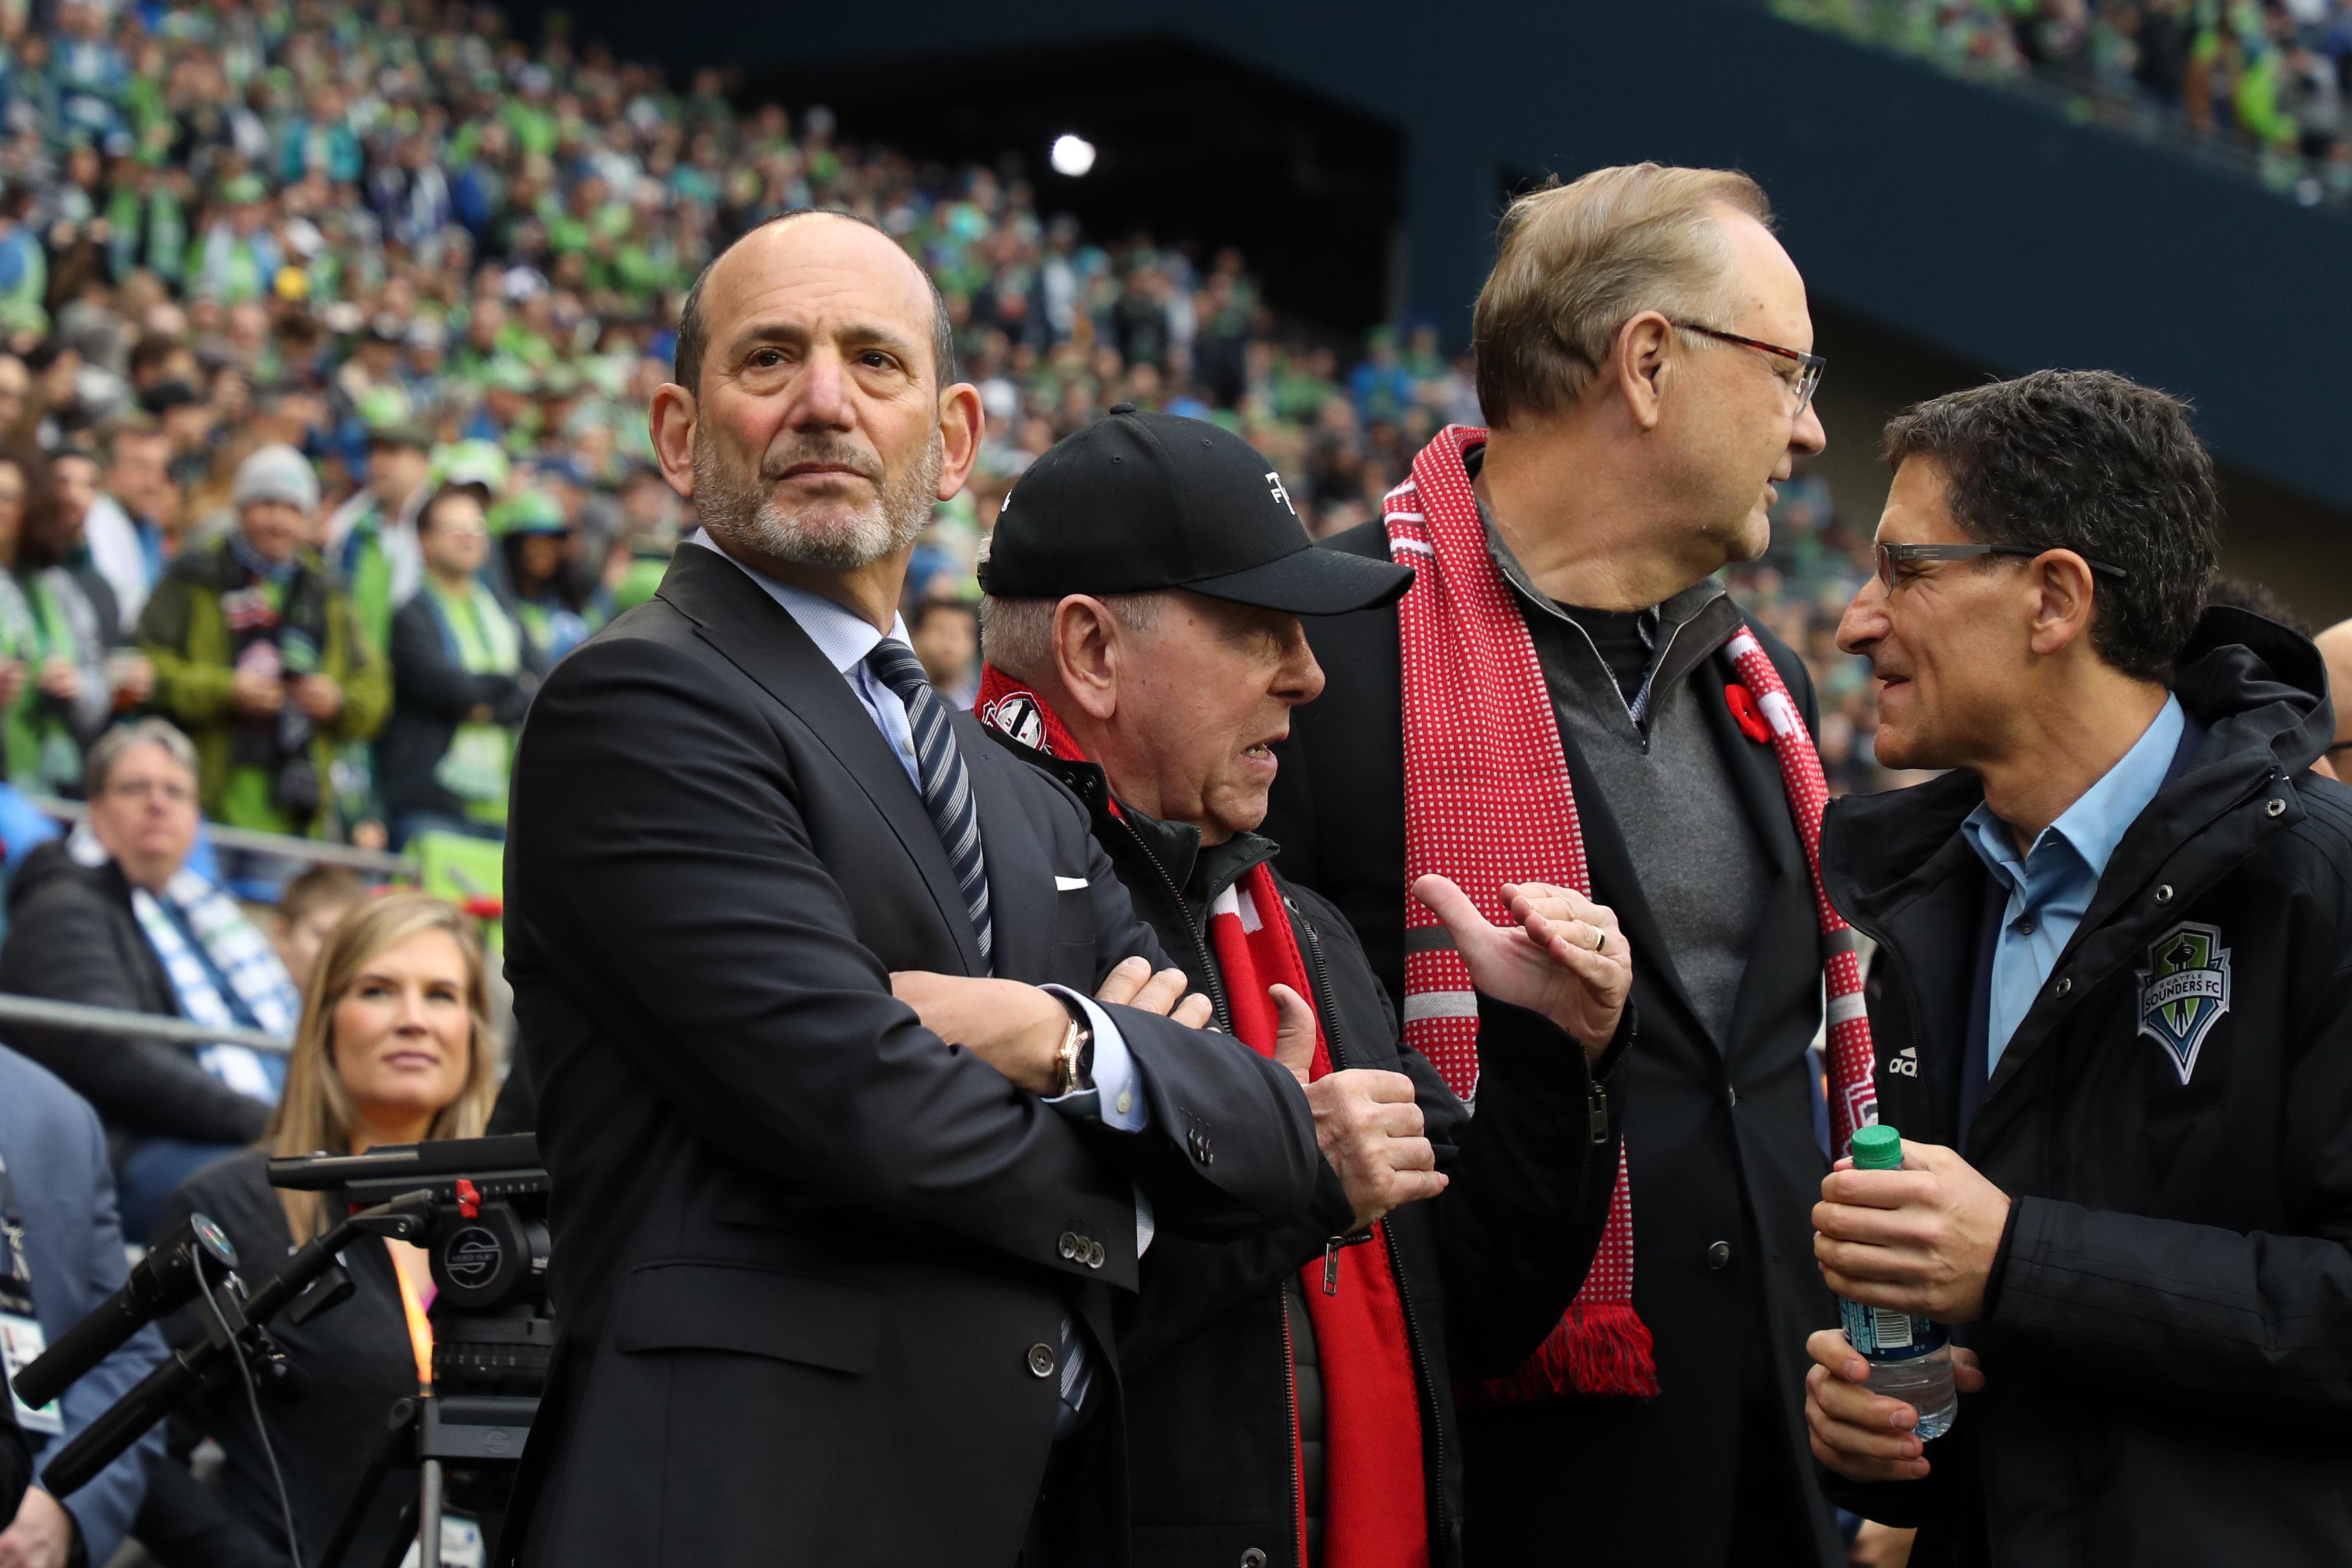 2019 MLS杯 - 多伦多FC对西雅图海湾